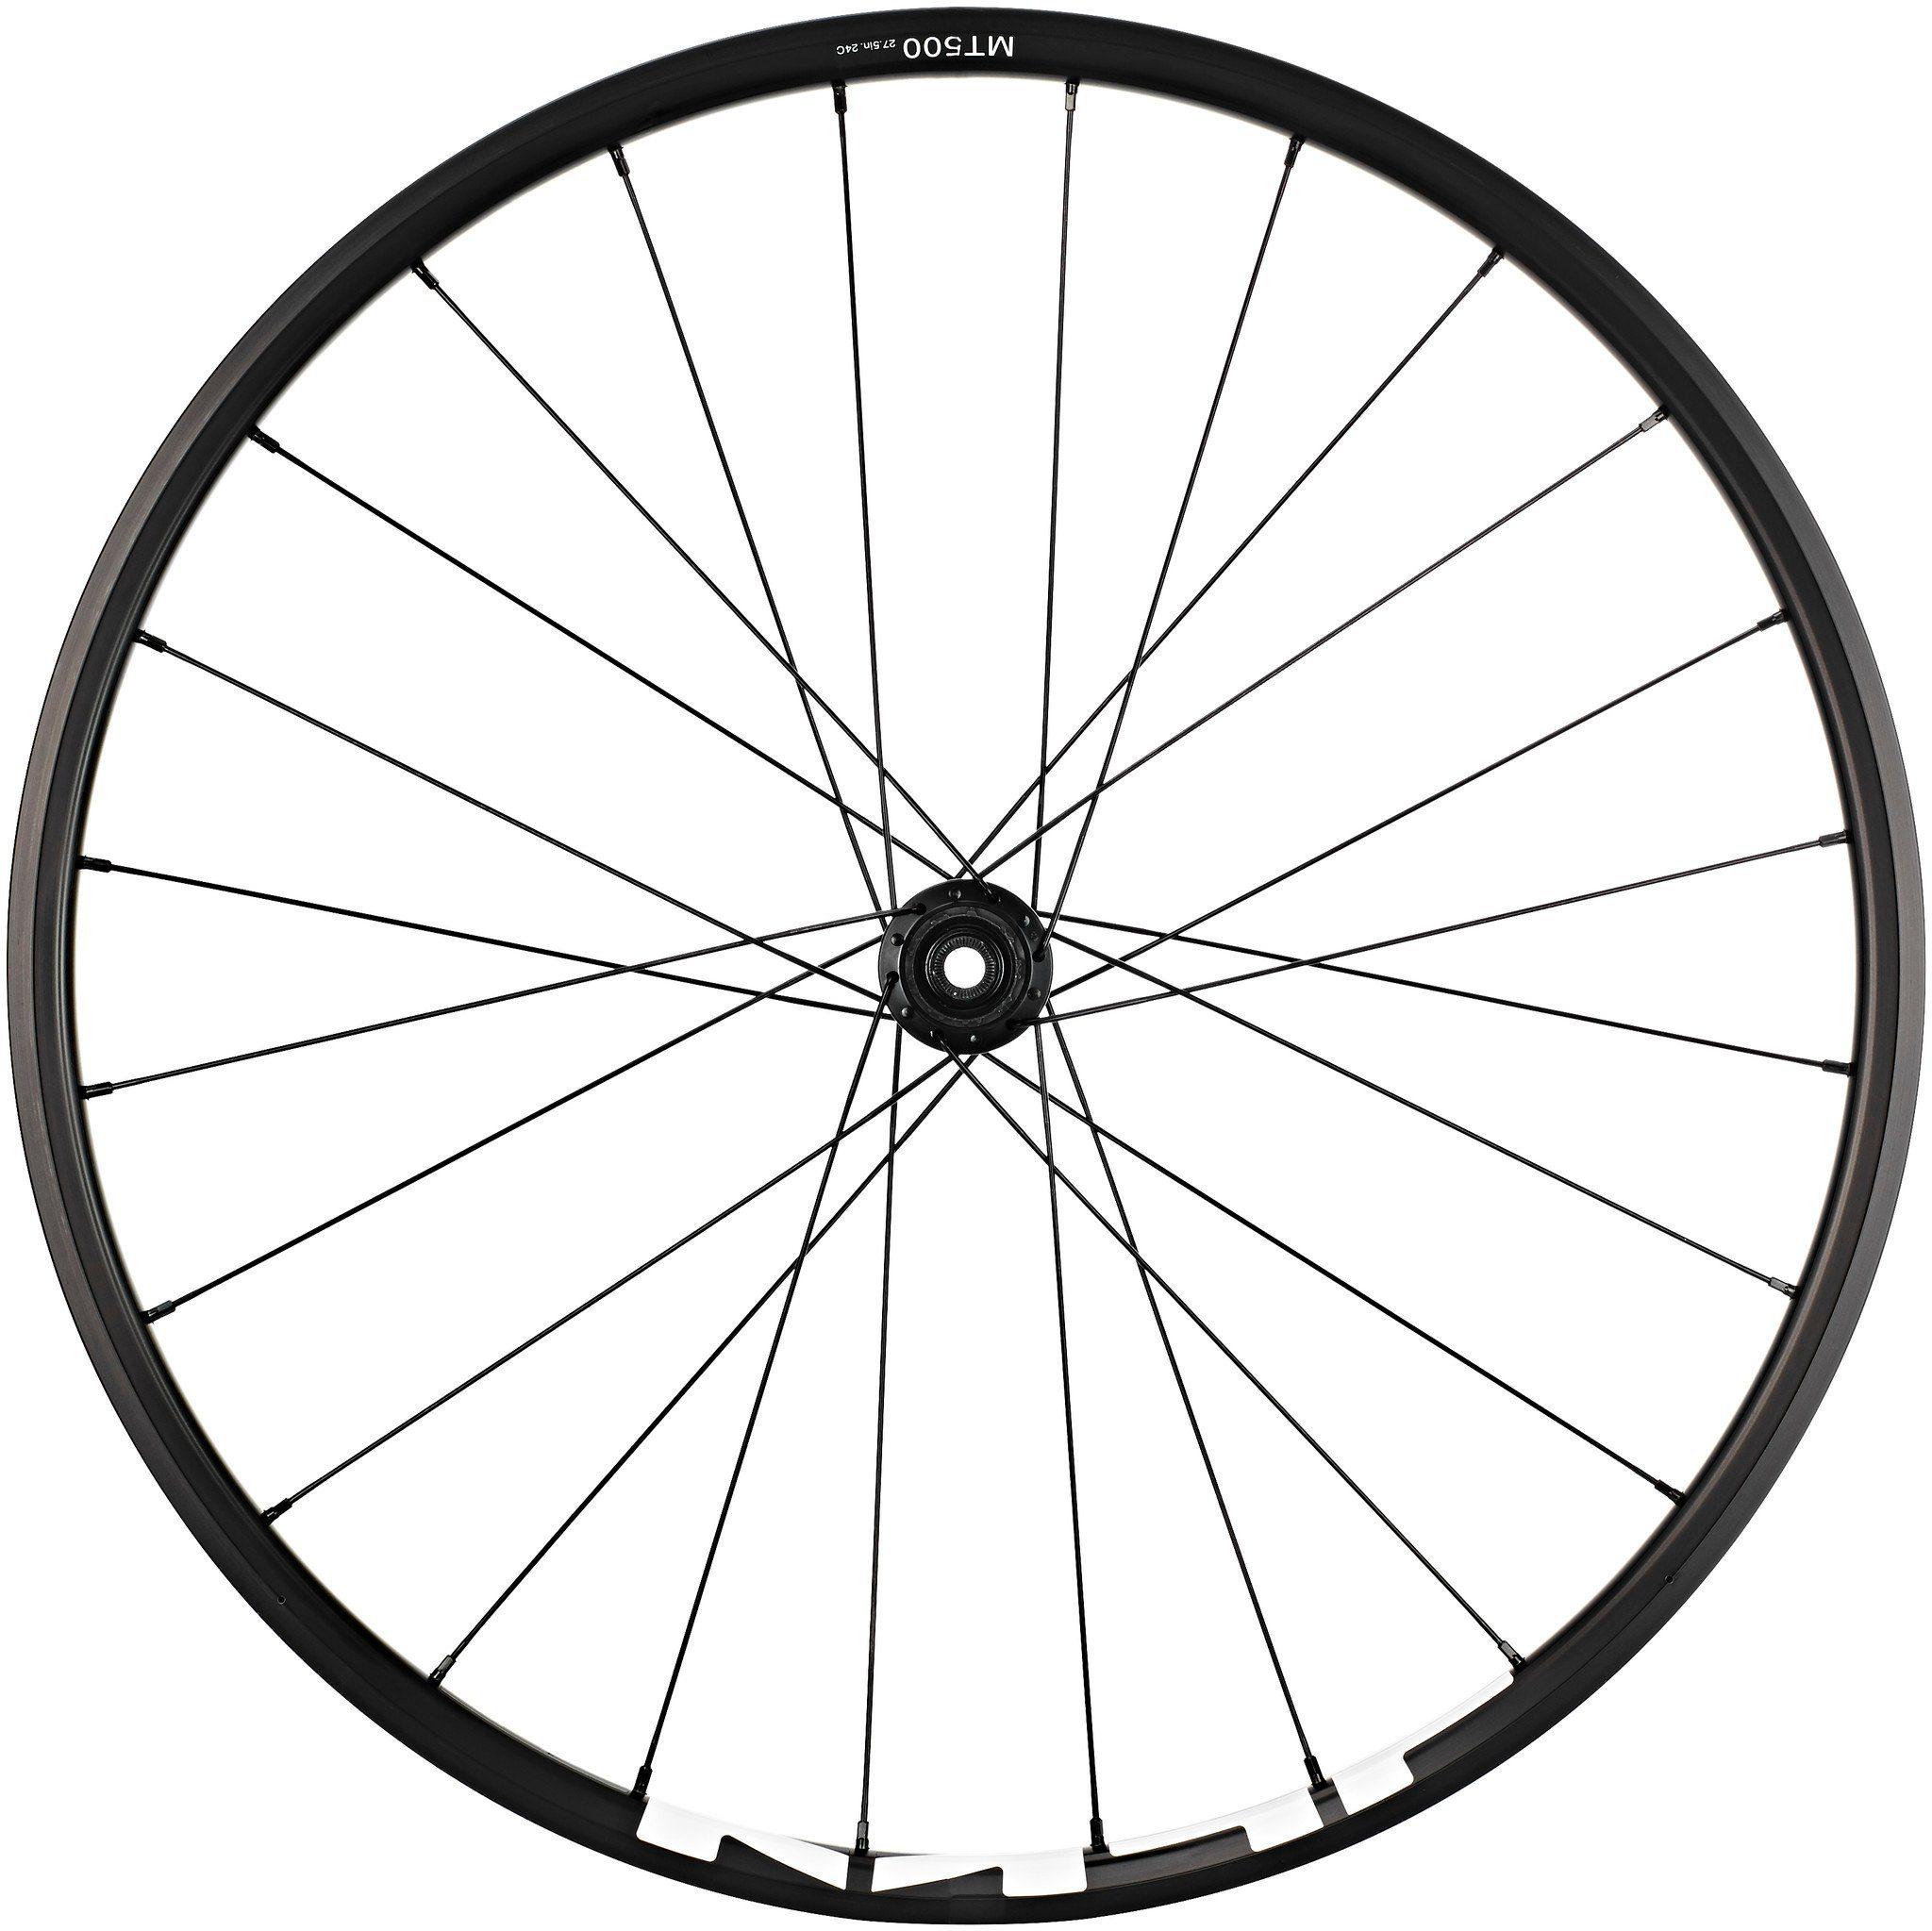 "Shimano Laufrad »WH-MT500 MTB Hinterrad 27,5"" Disc CL Clincher«"